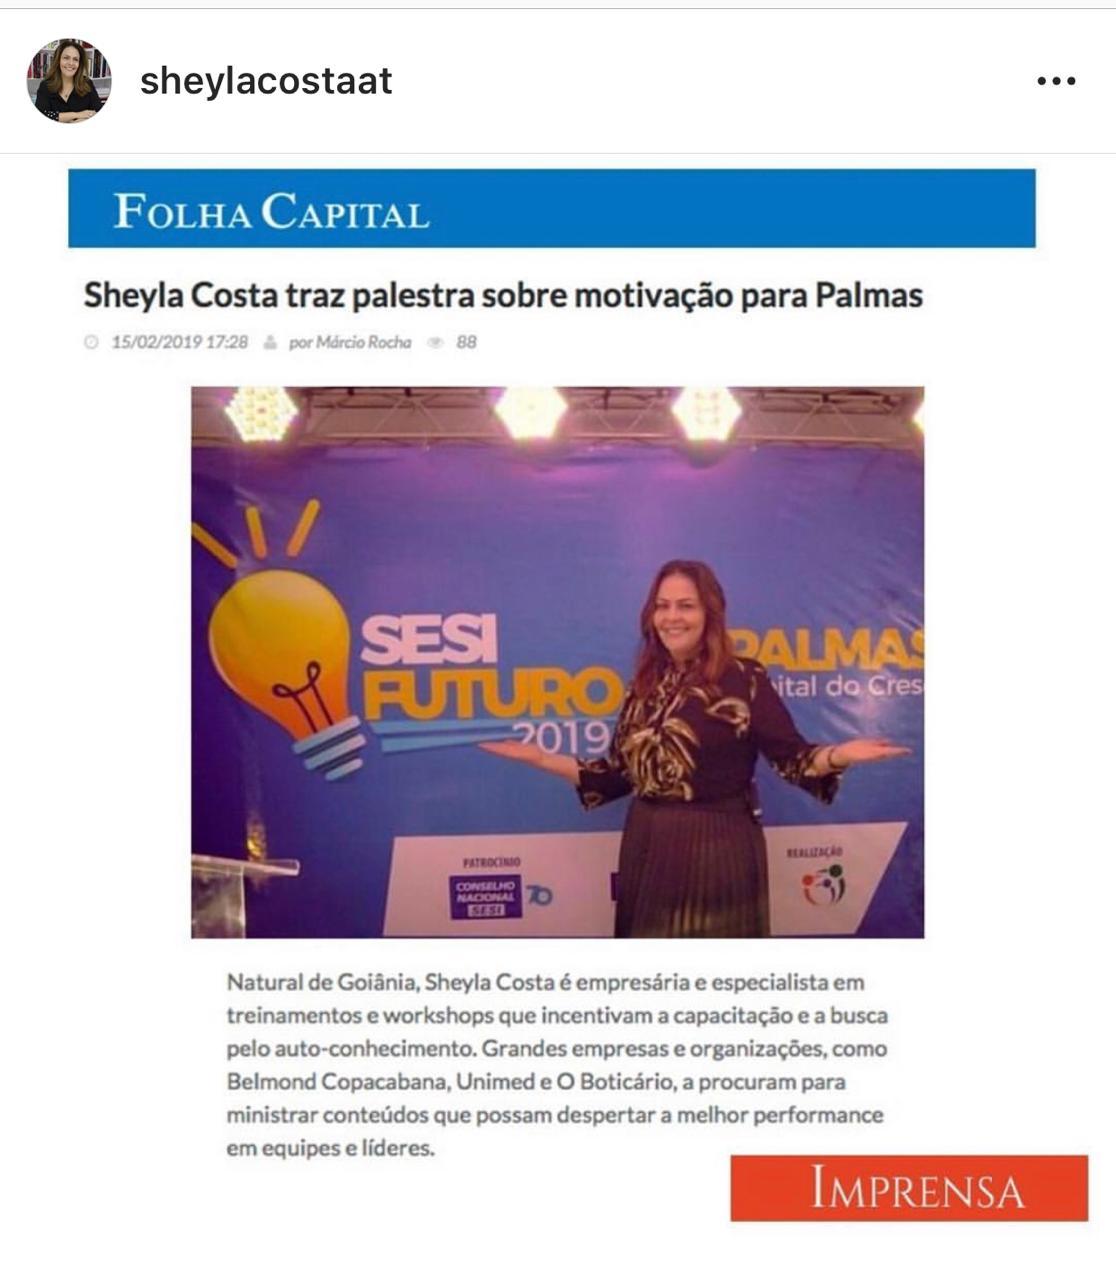 Folha Capital